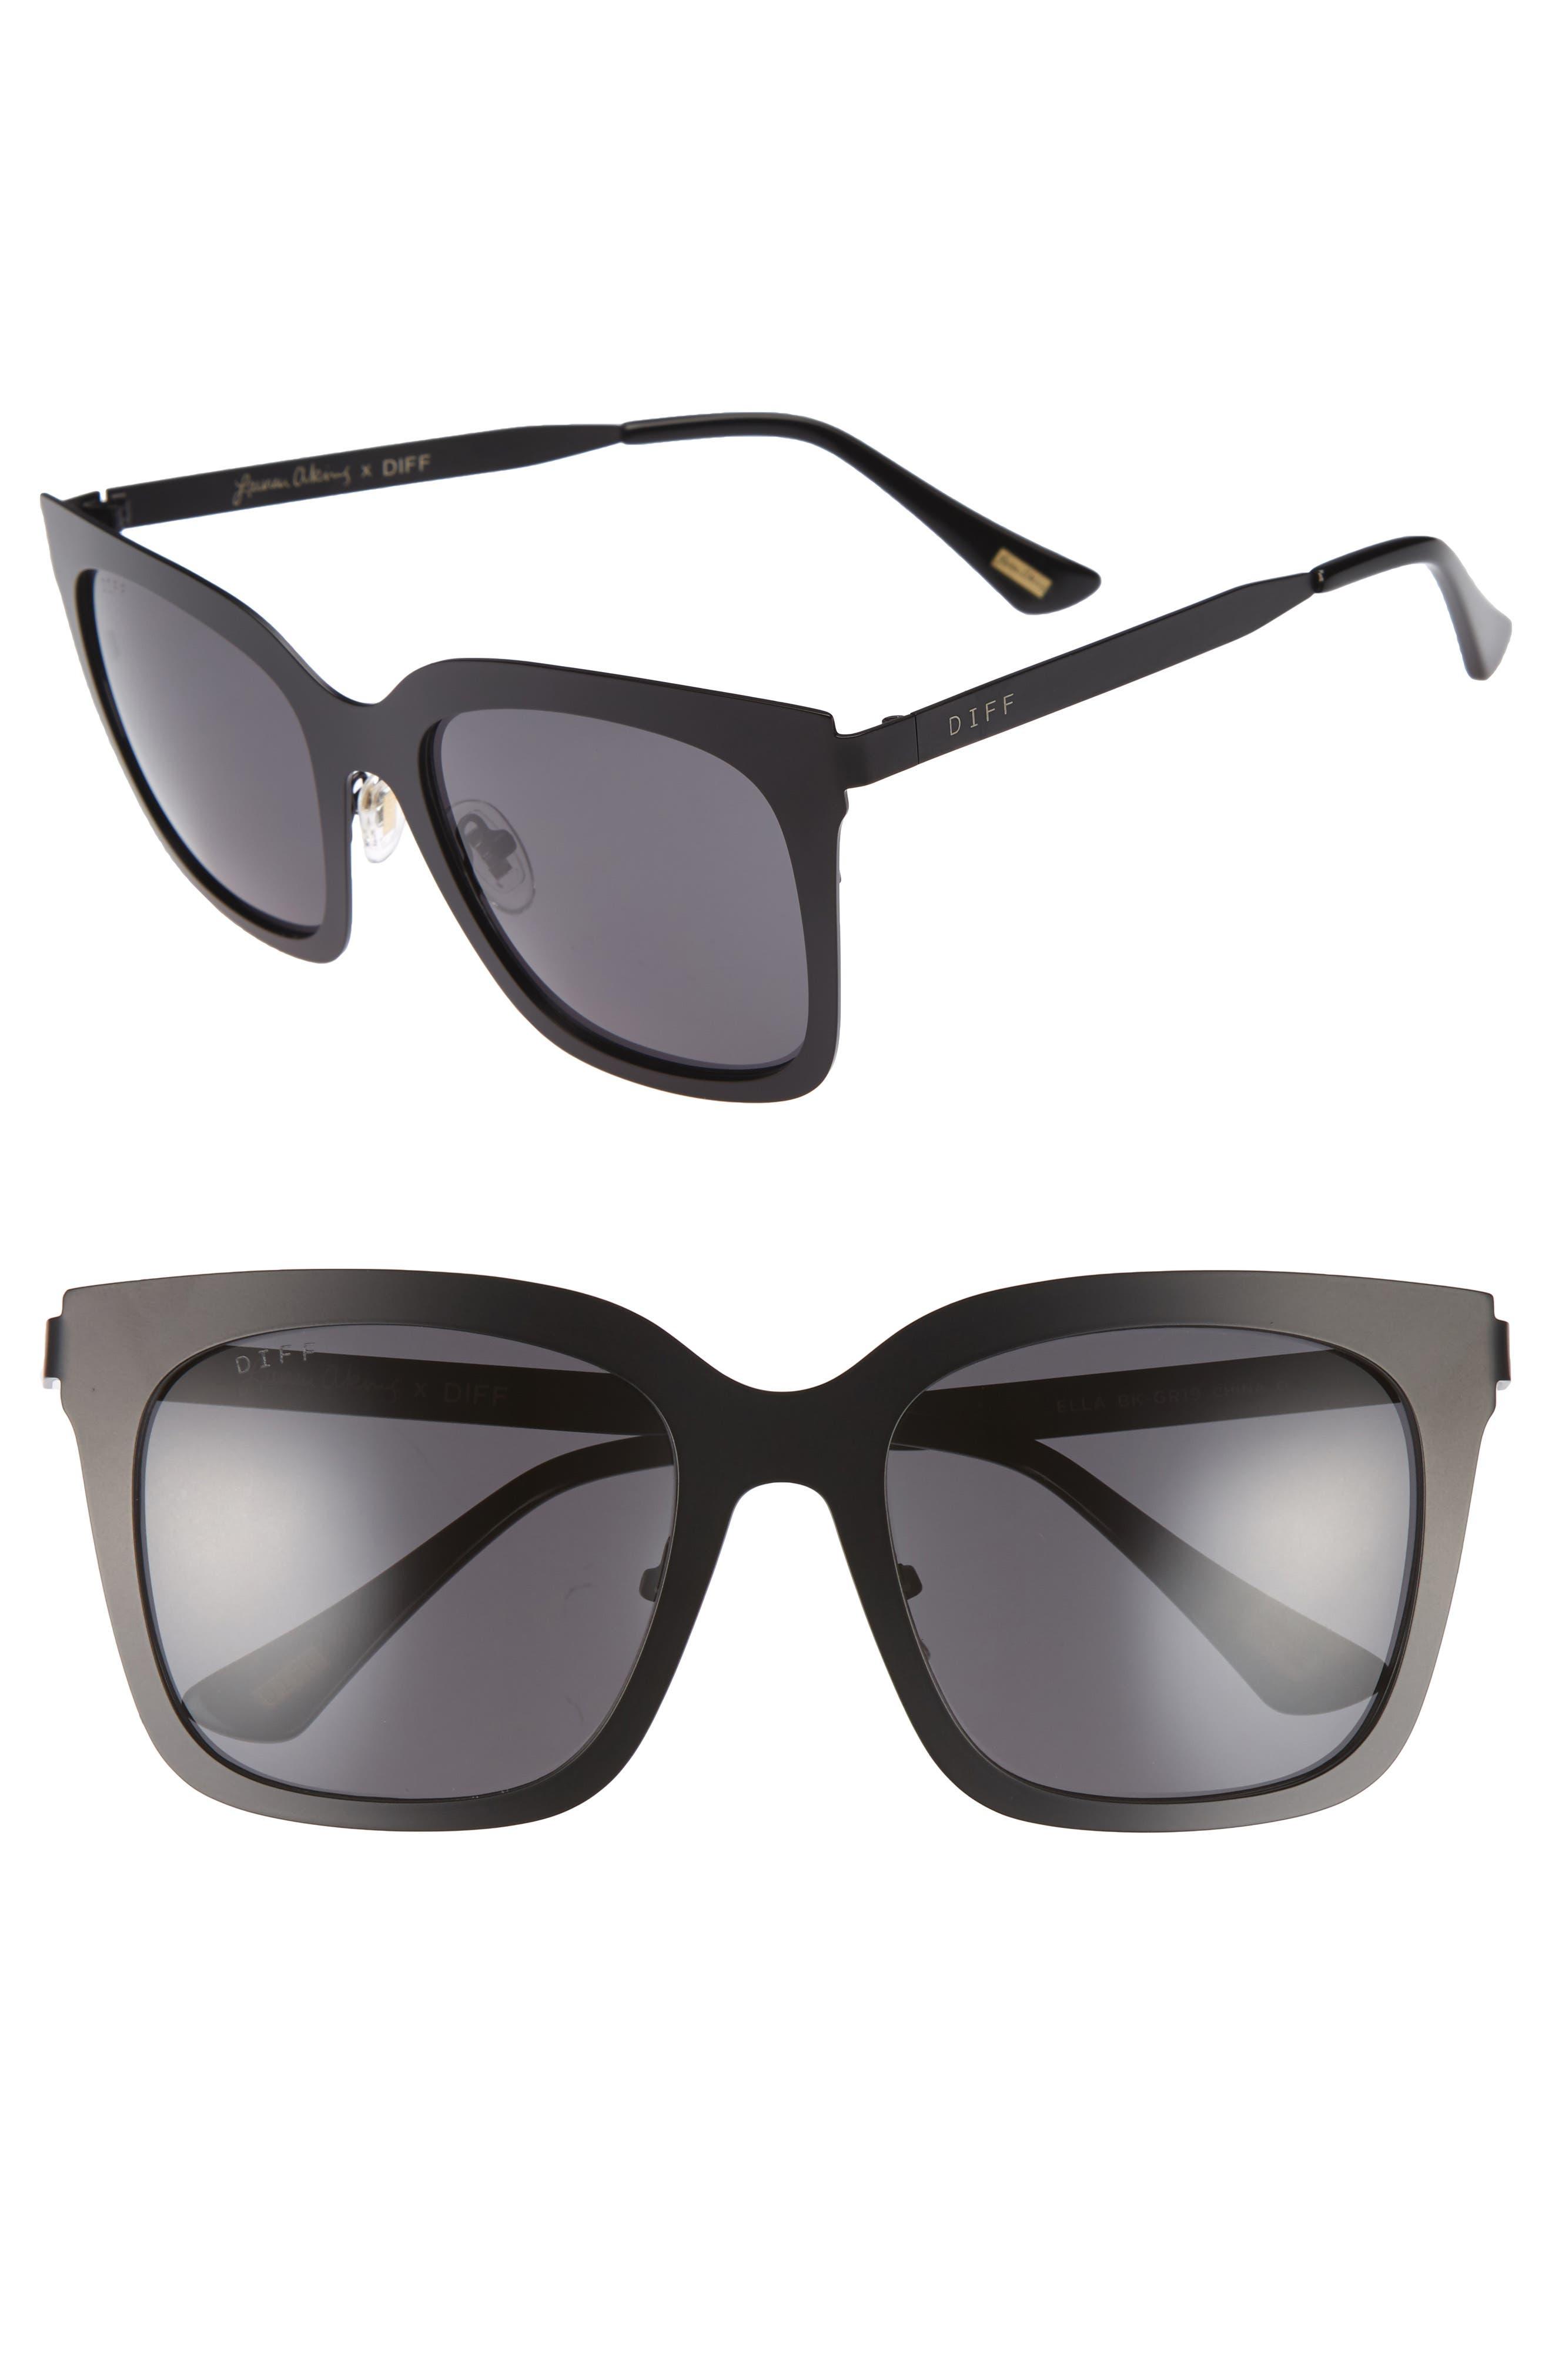 Main Image - DIFF x Lauren Akins Ella 53mm Cat Eye Sunglasses